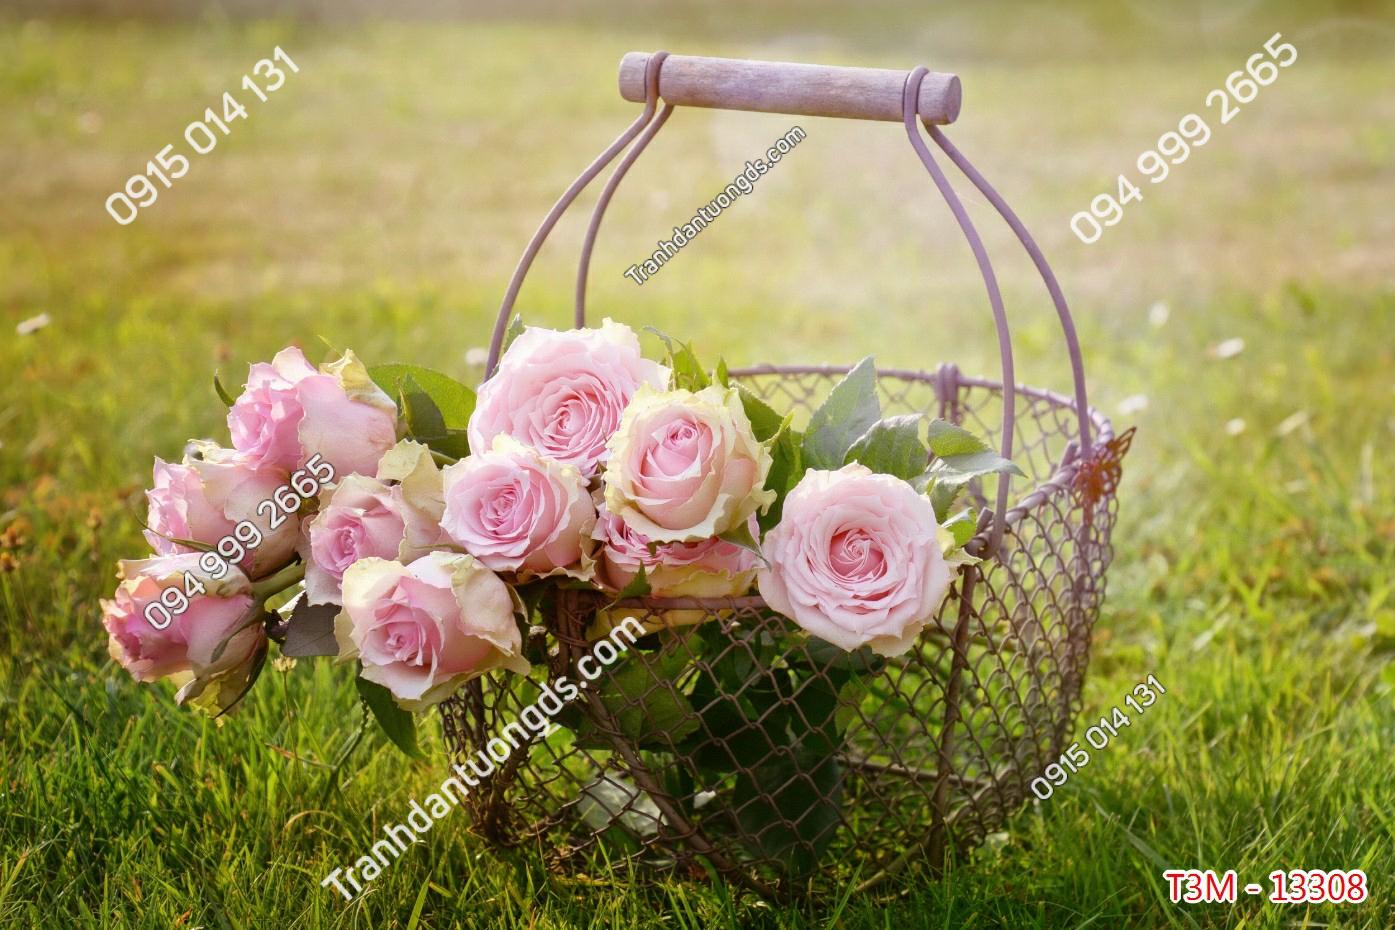 Tranh dán tường lẵng hoa hồng - 13308 demo